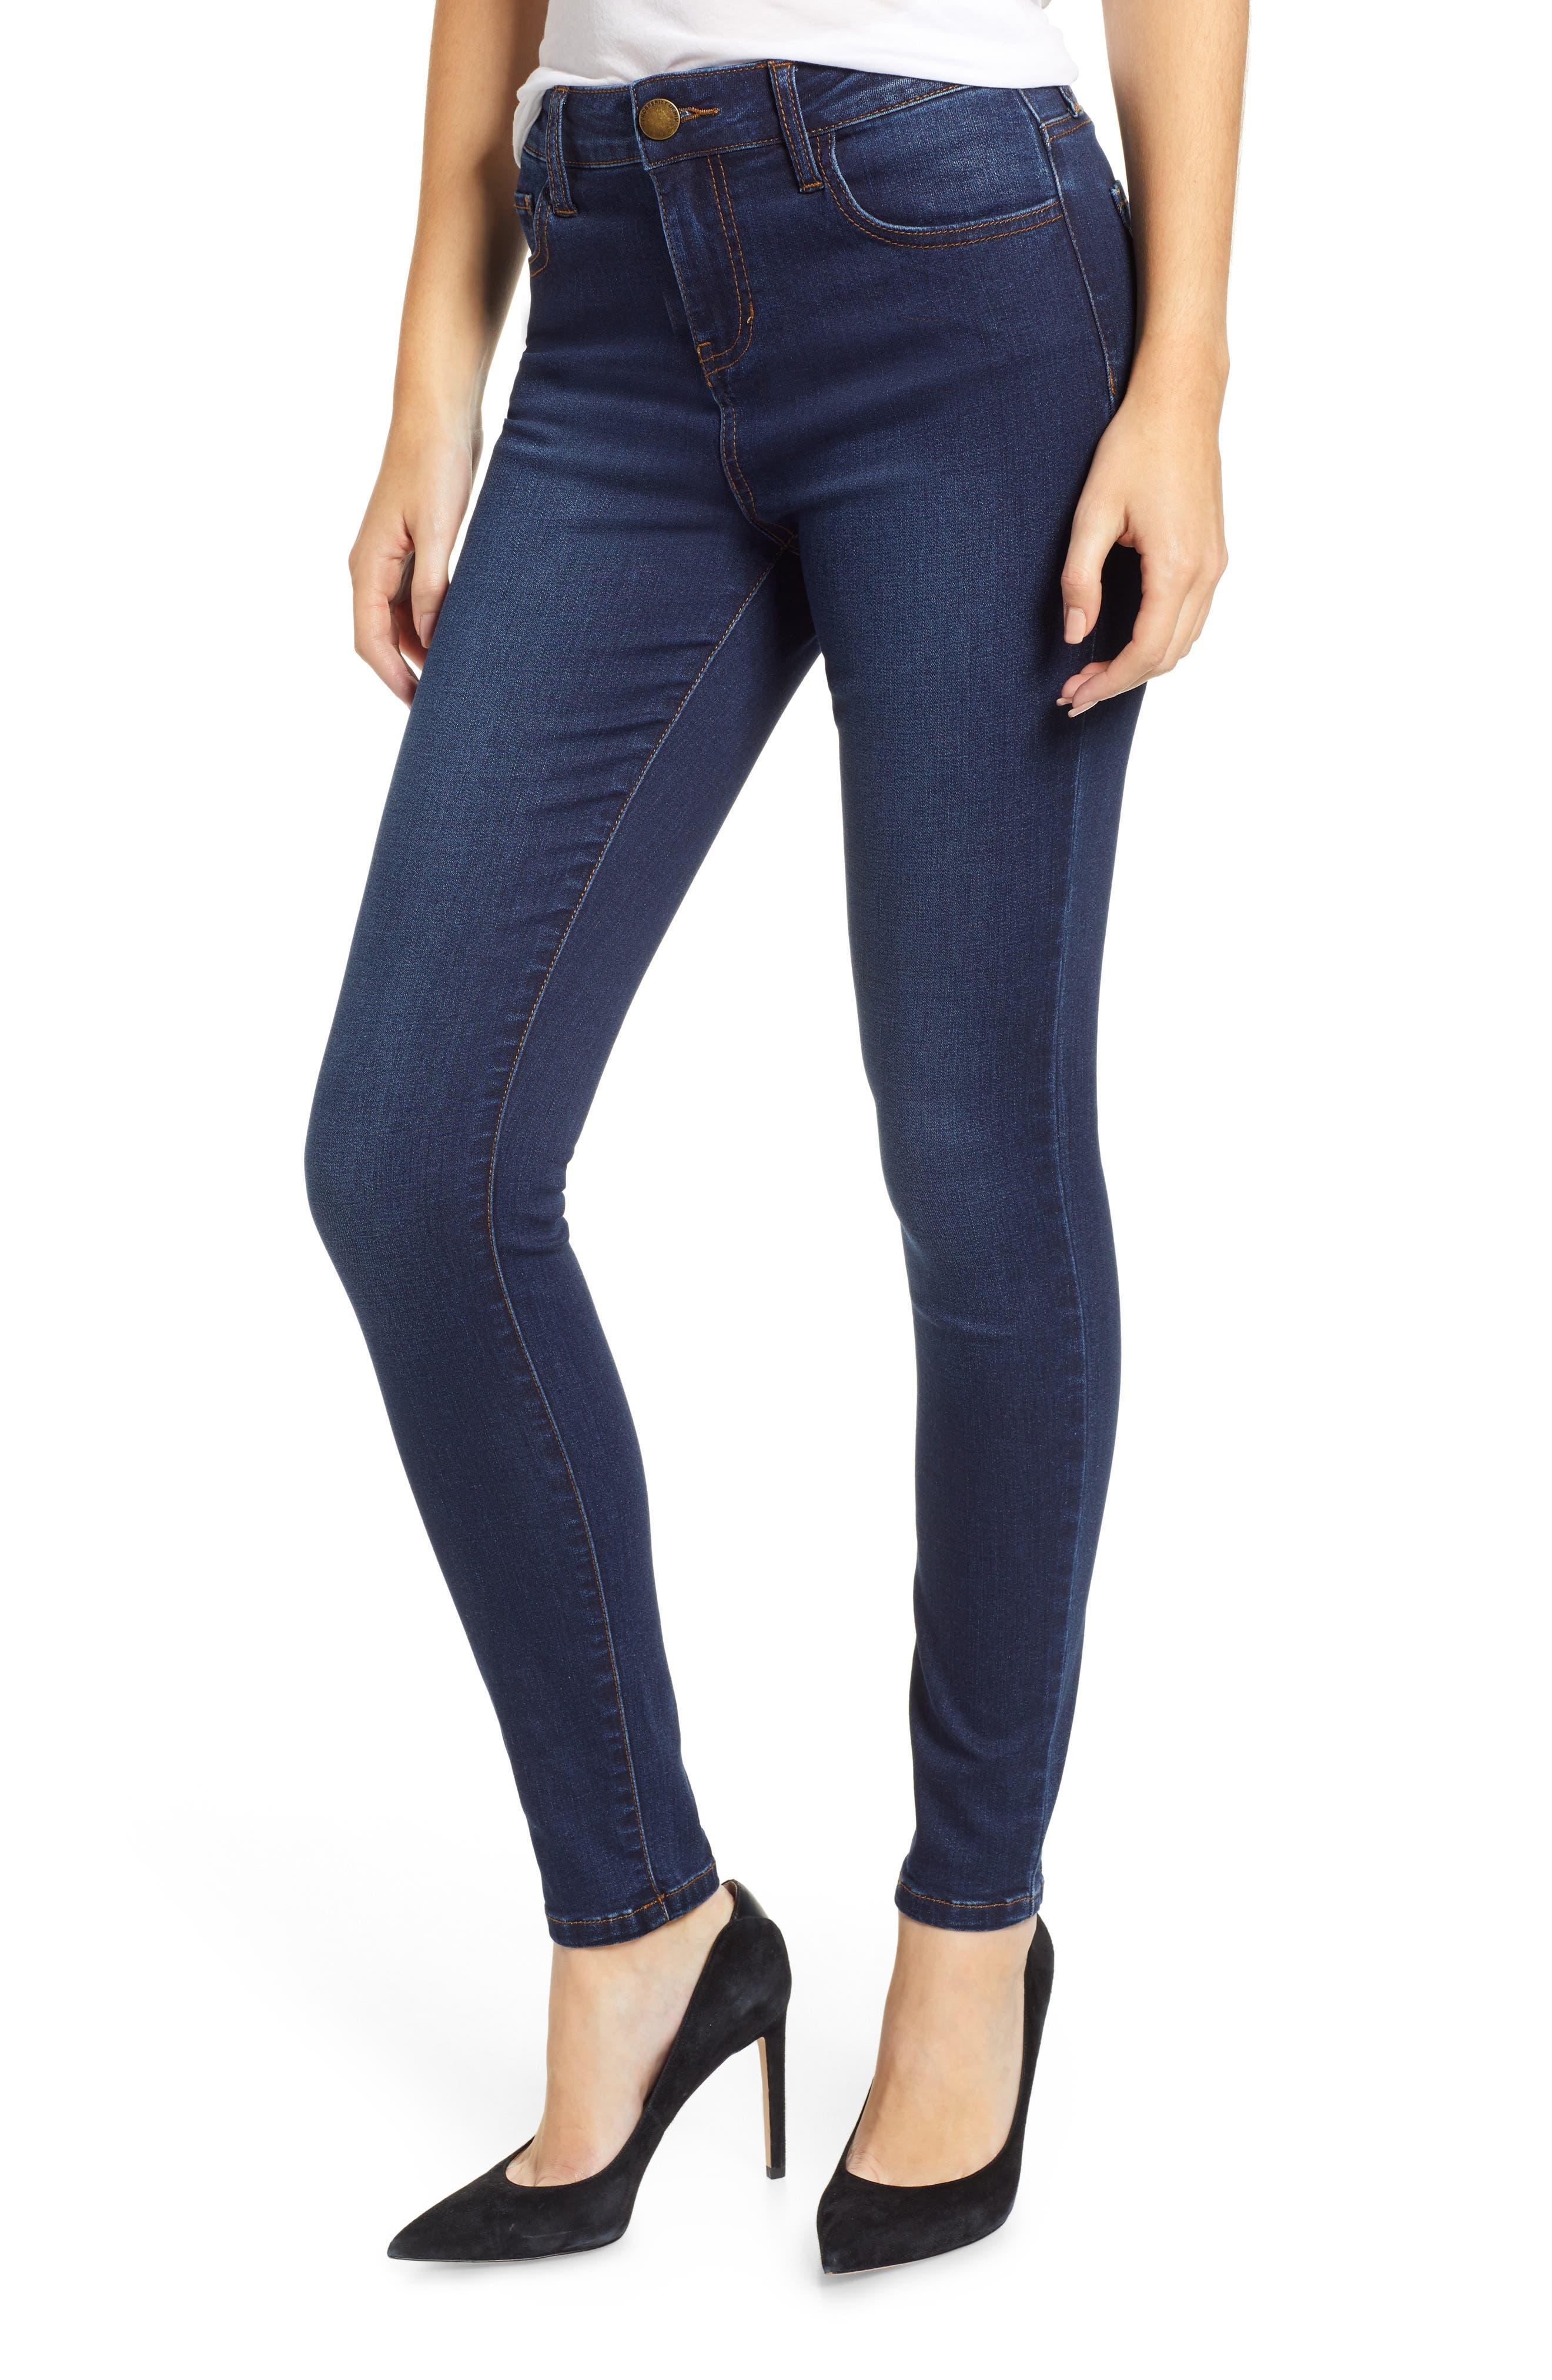 PROSPERITY DENIM High Waist Skinny Jeans, Main, color, DARK